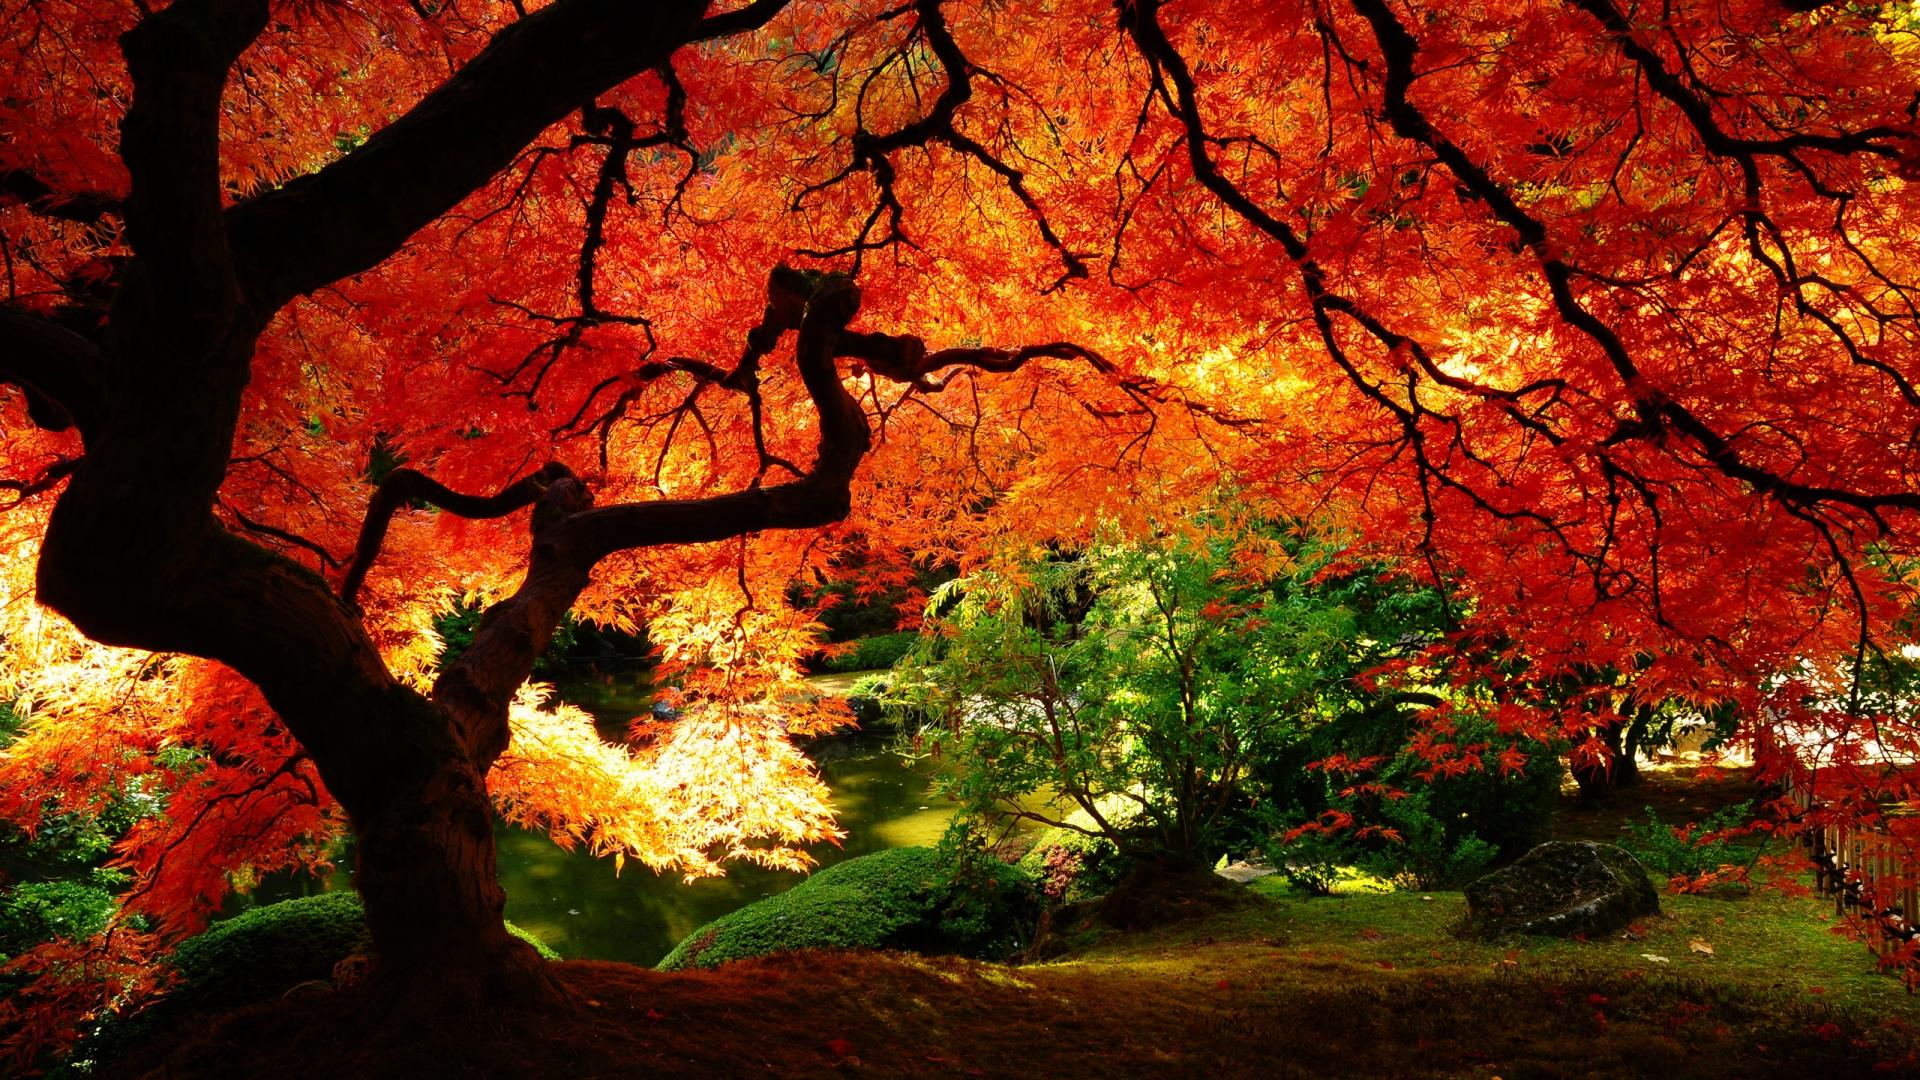 hd-wallpapers-free-autumn-desktop-background